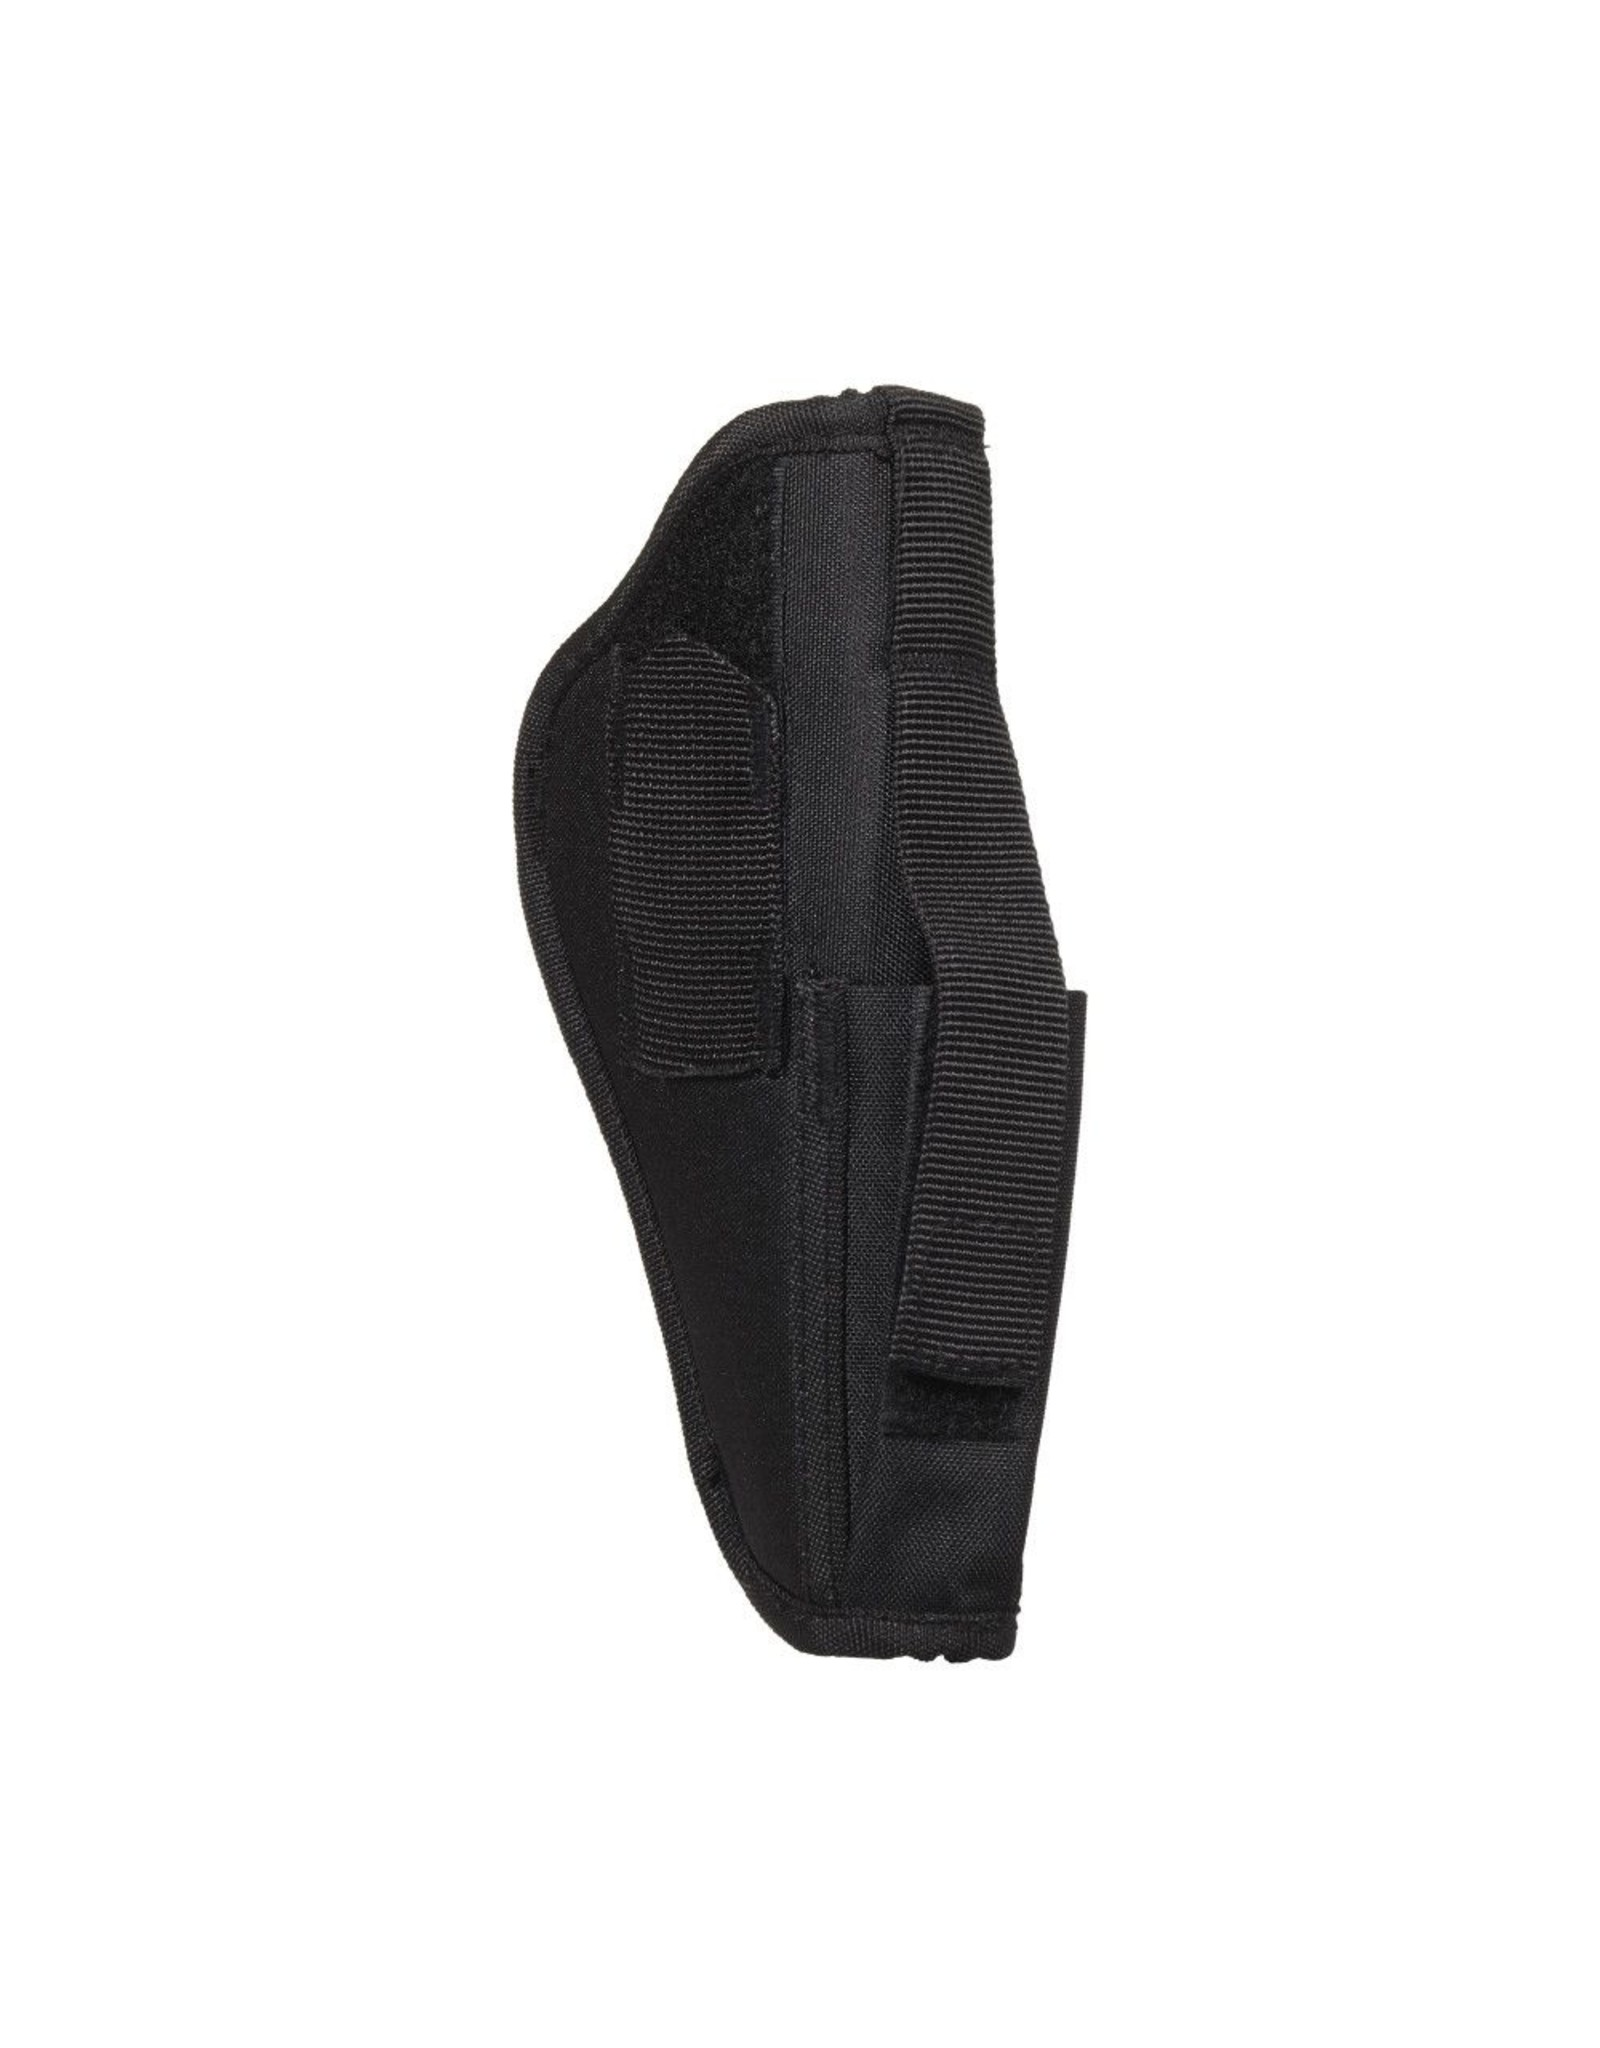 "ALLEN COMPANY Allen Company Semi-Auto Handgun Holster, Ambidextrous, 4.5-5"" Barrel Large Frame Semi-Auto Handguns, Black"